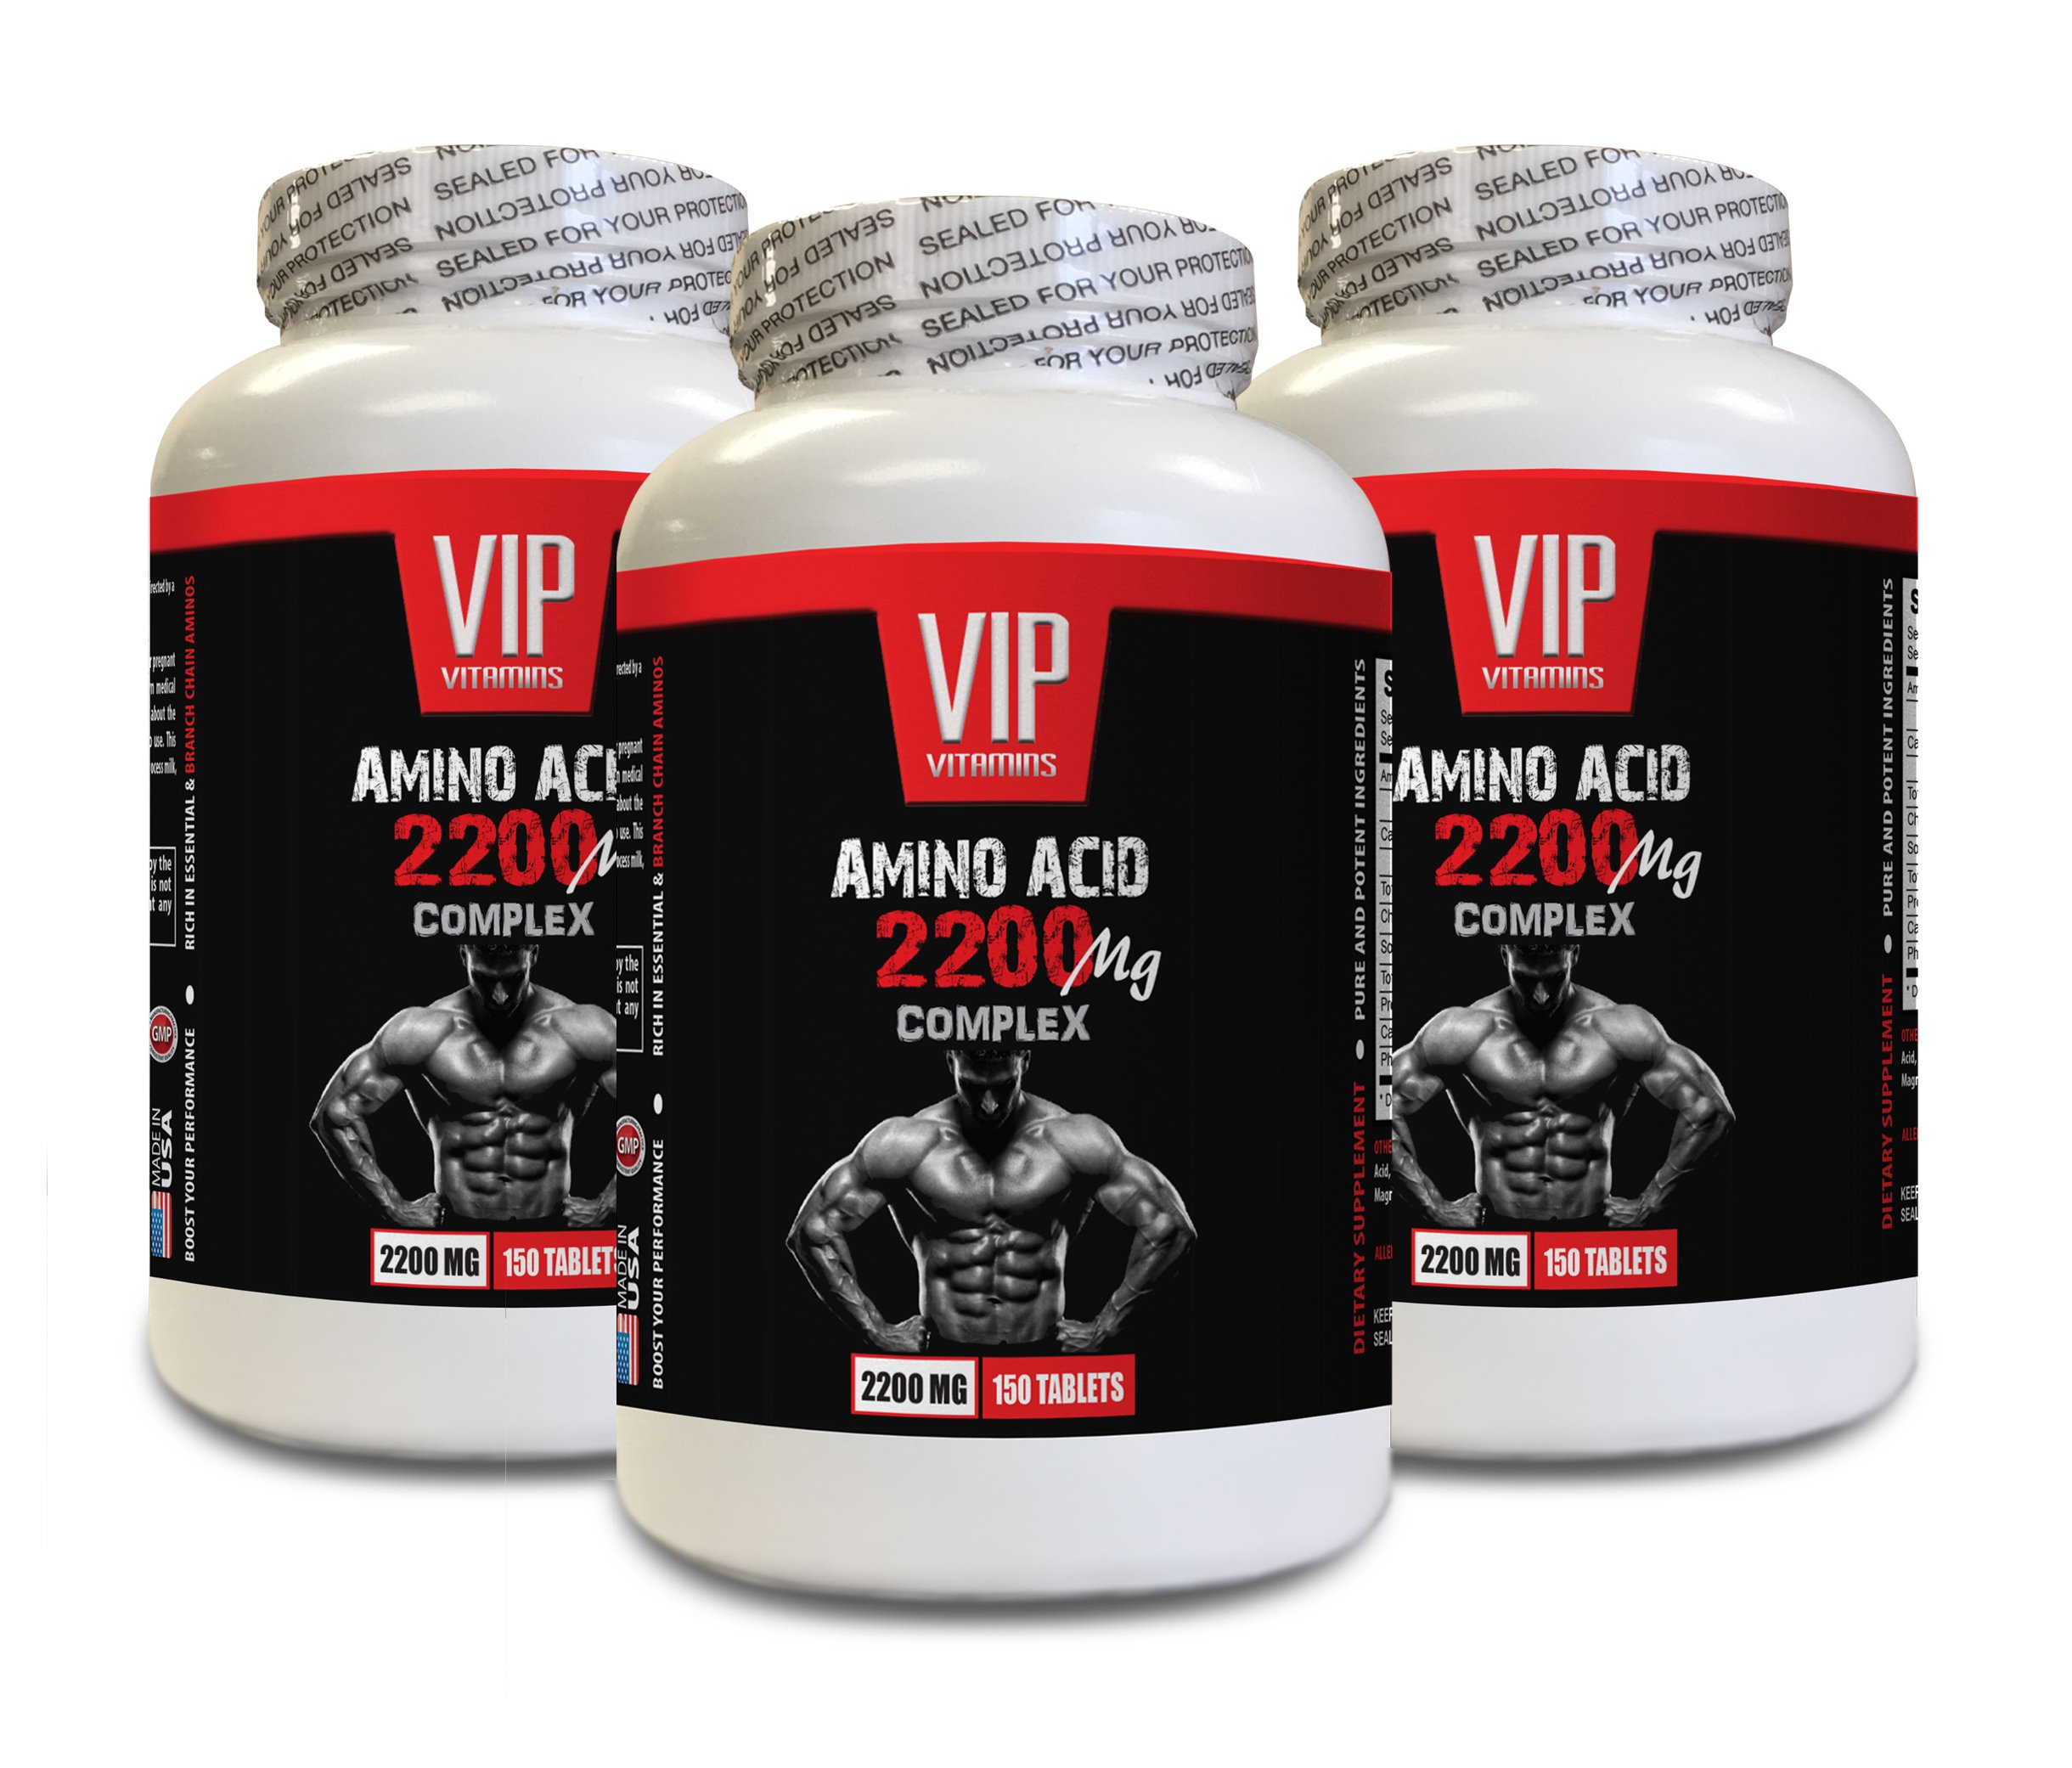 bodybuilding supplements testosterone - AMINO ACIDS COMPLEX 2200 MG - l-lysine tablets - 3 Bottles 450 Tablets